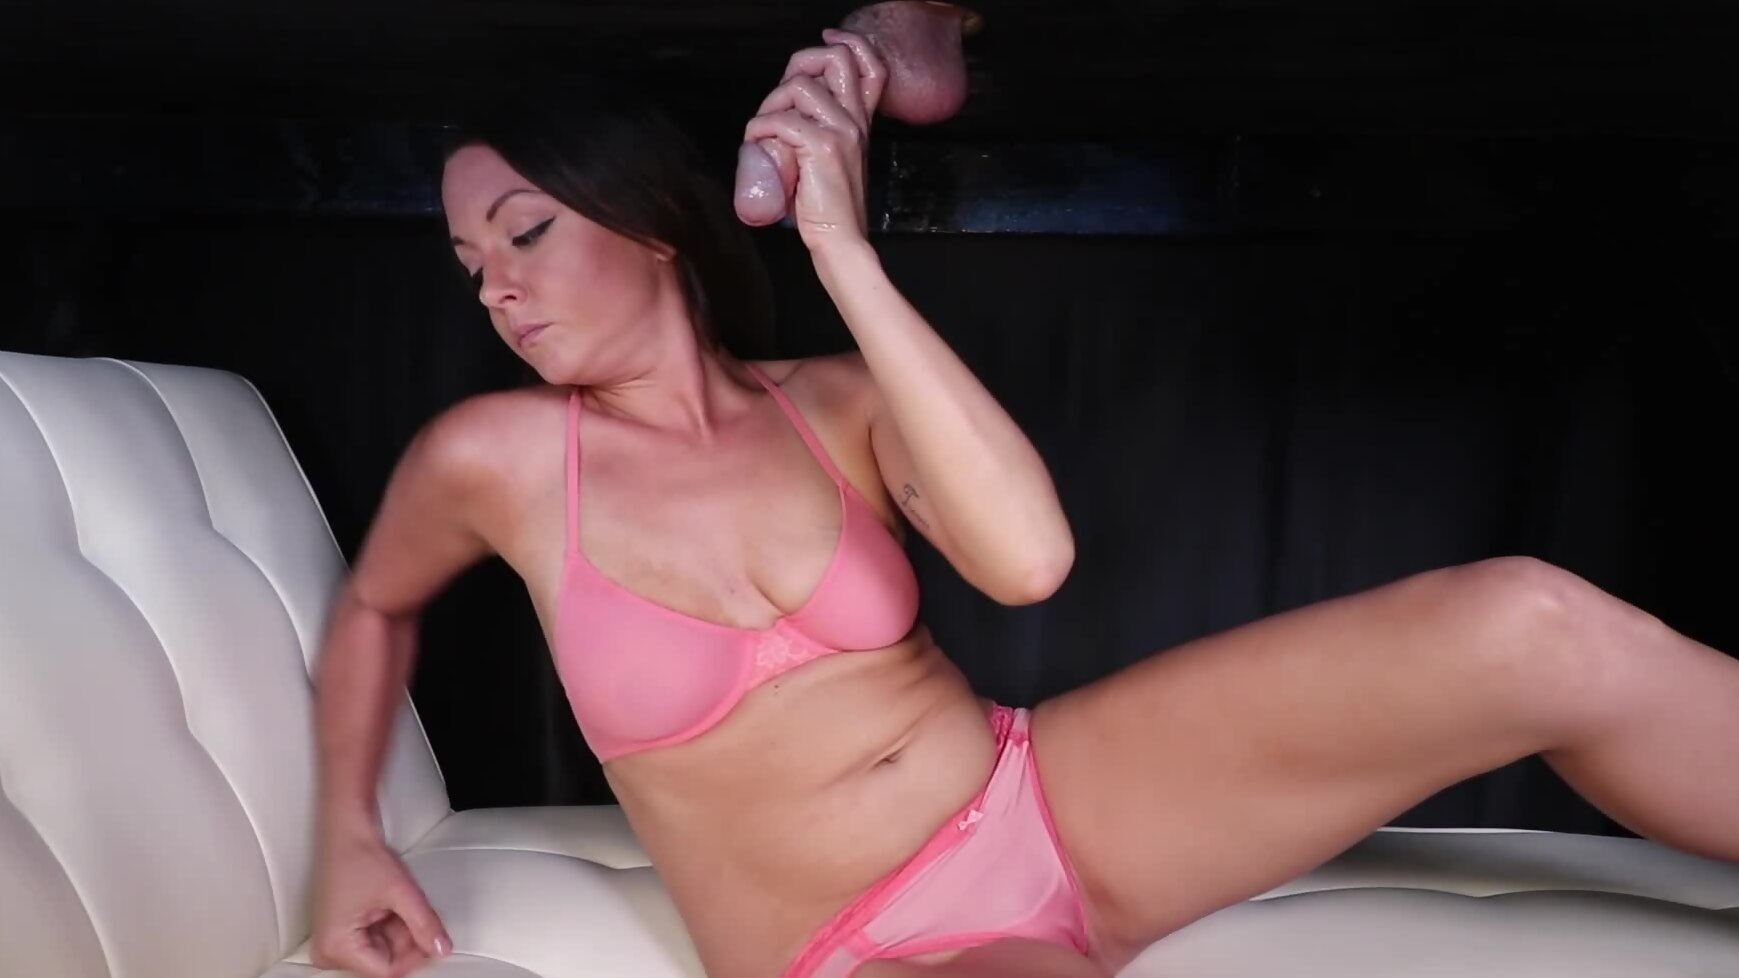 Splendid masseuse in pink lingerie milks cock under the t...